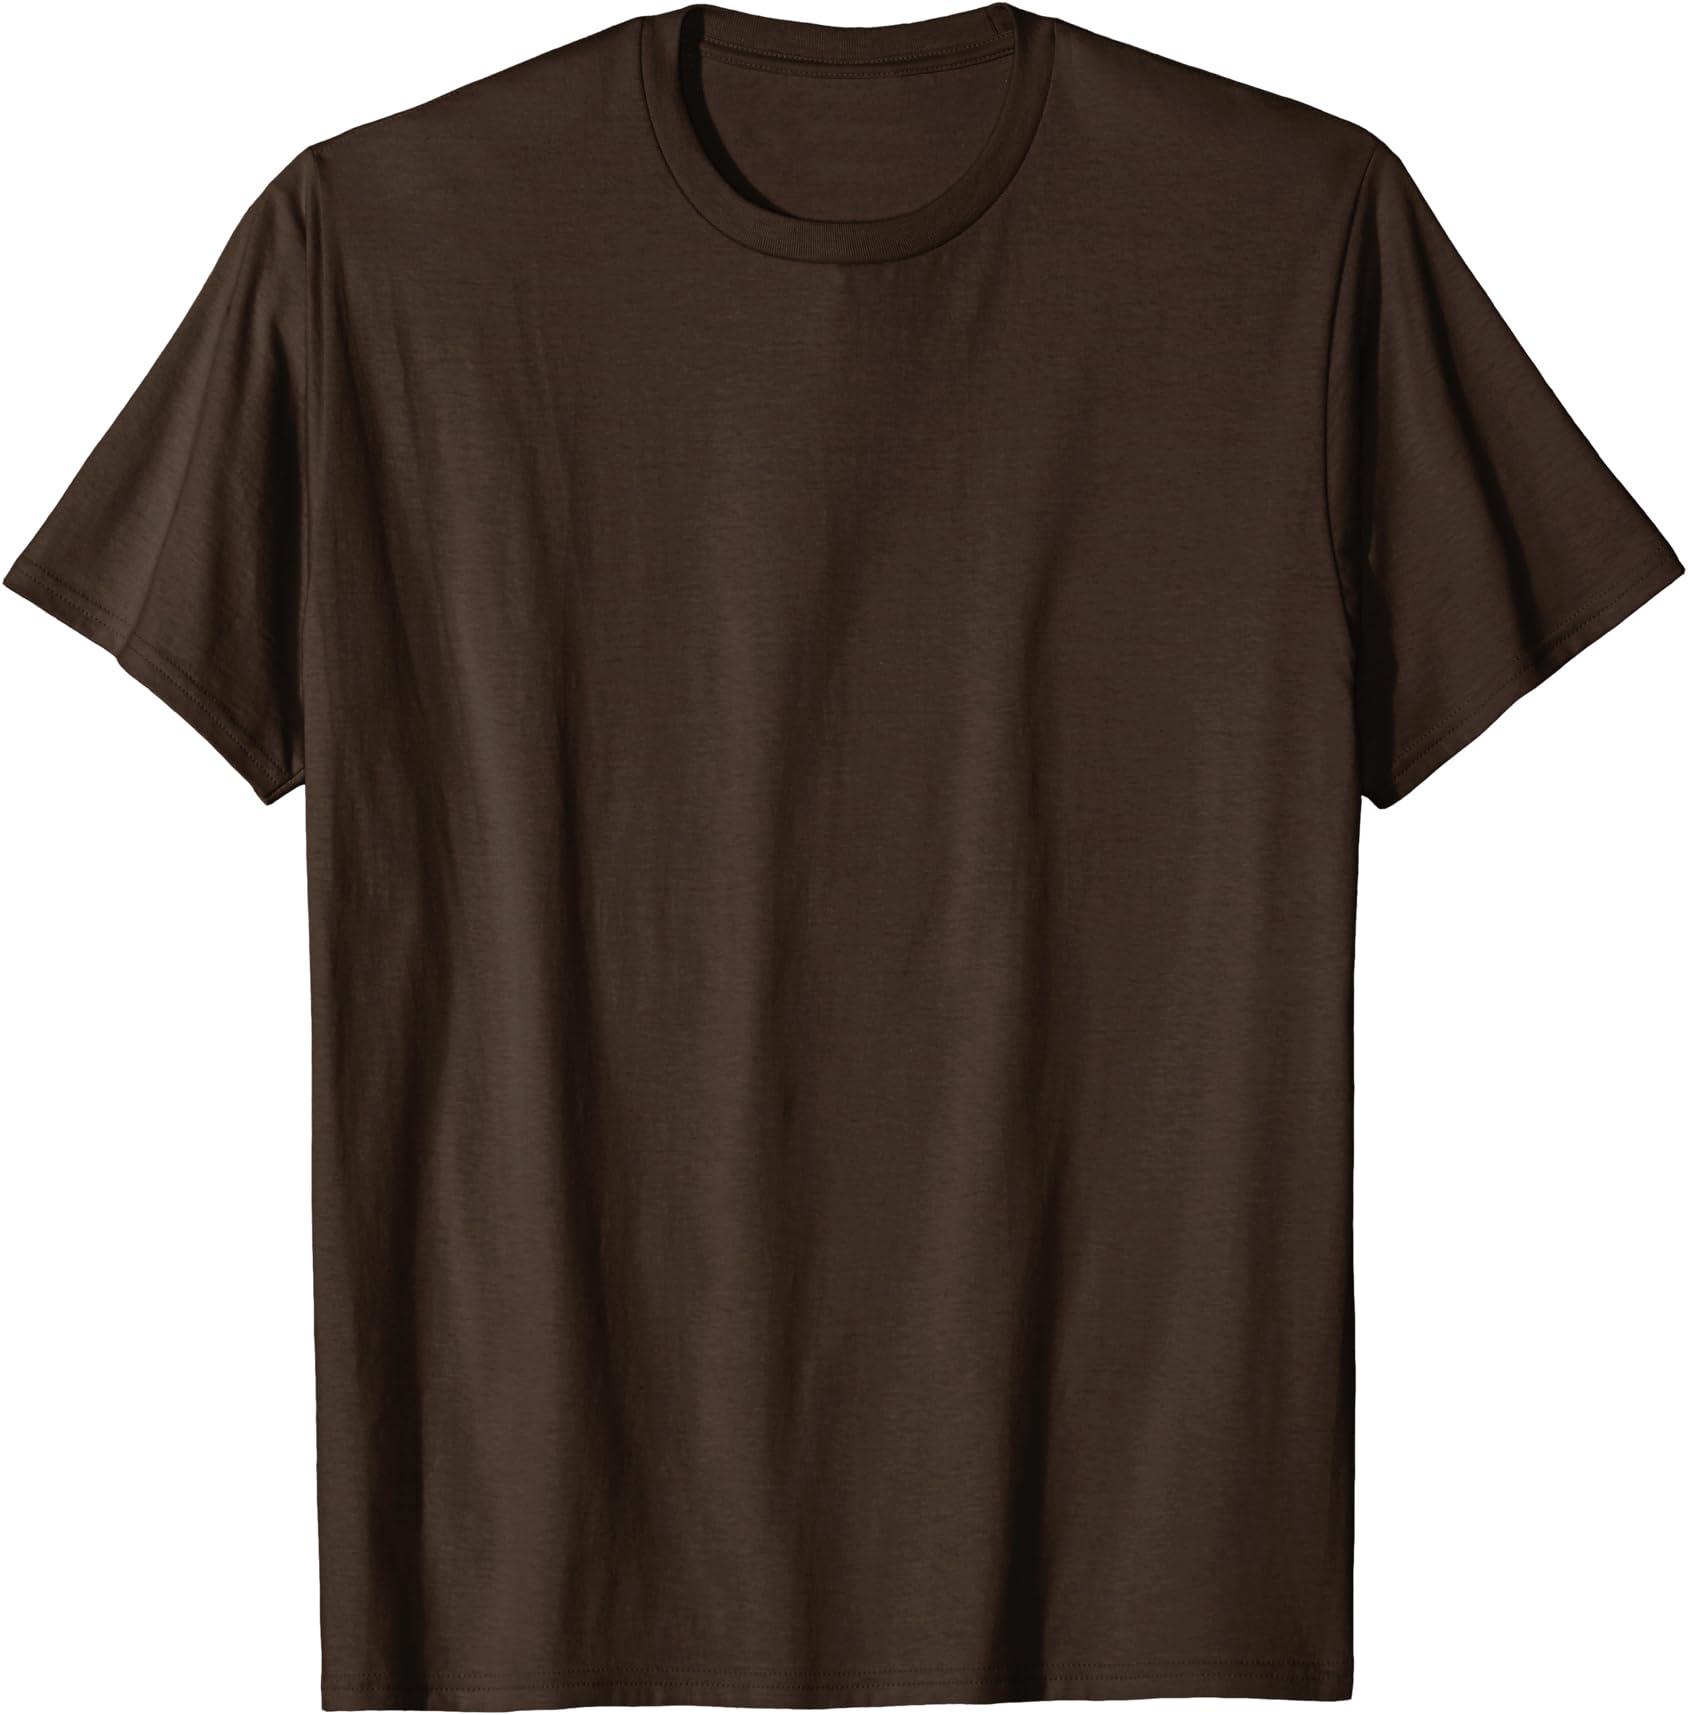 Im Really A Chipmunk Shirt Clothing Tee Shirt